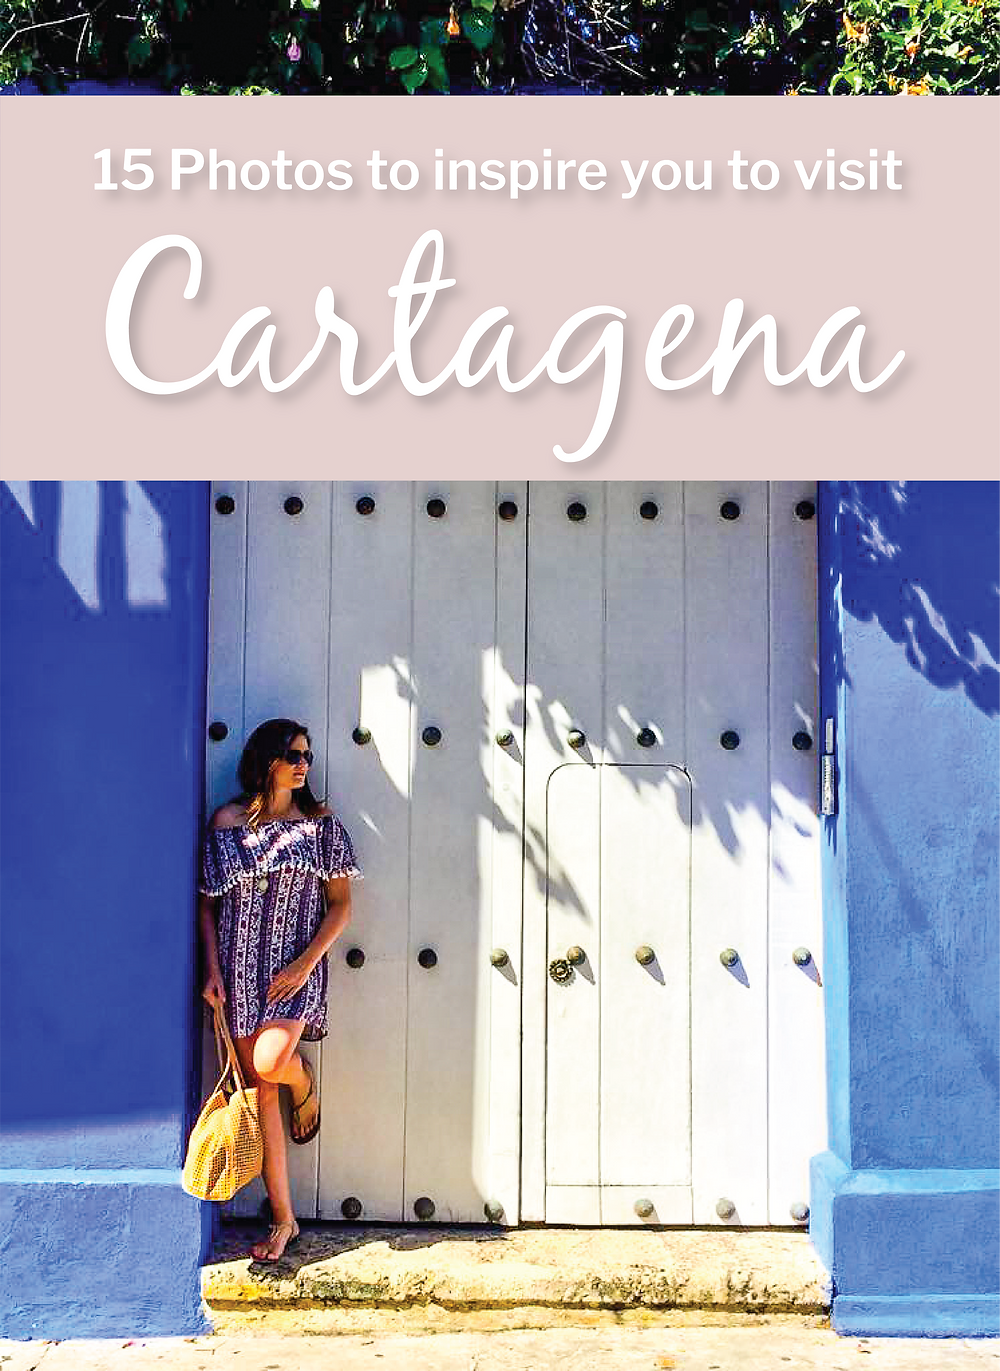 photos to inspire your trip to Cartagena